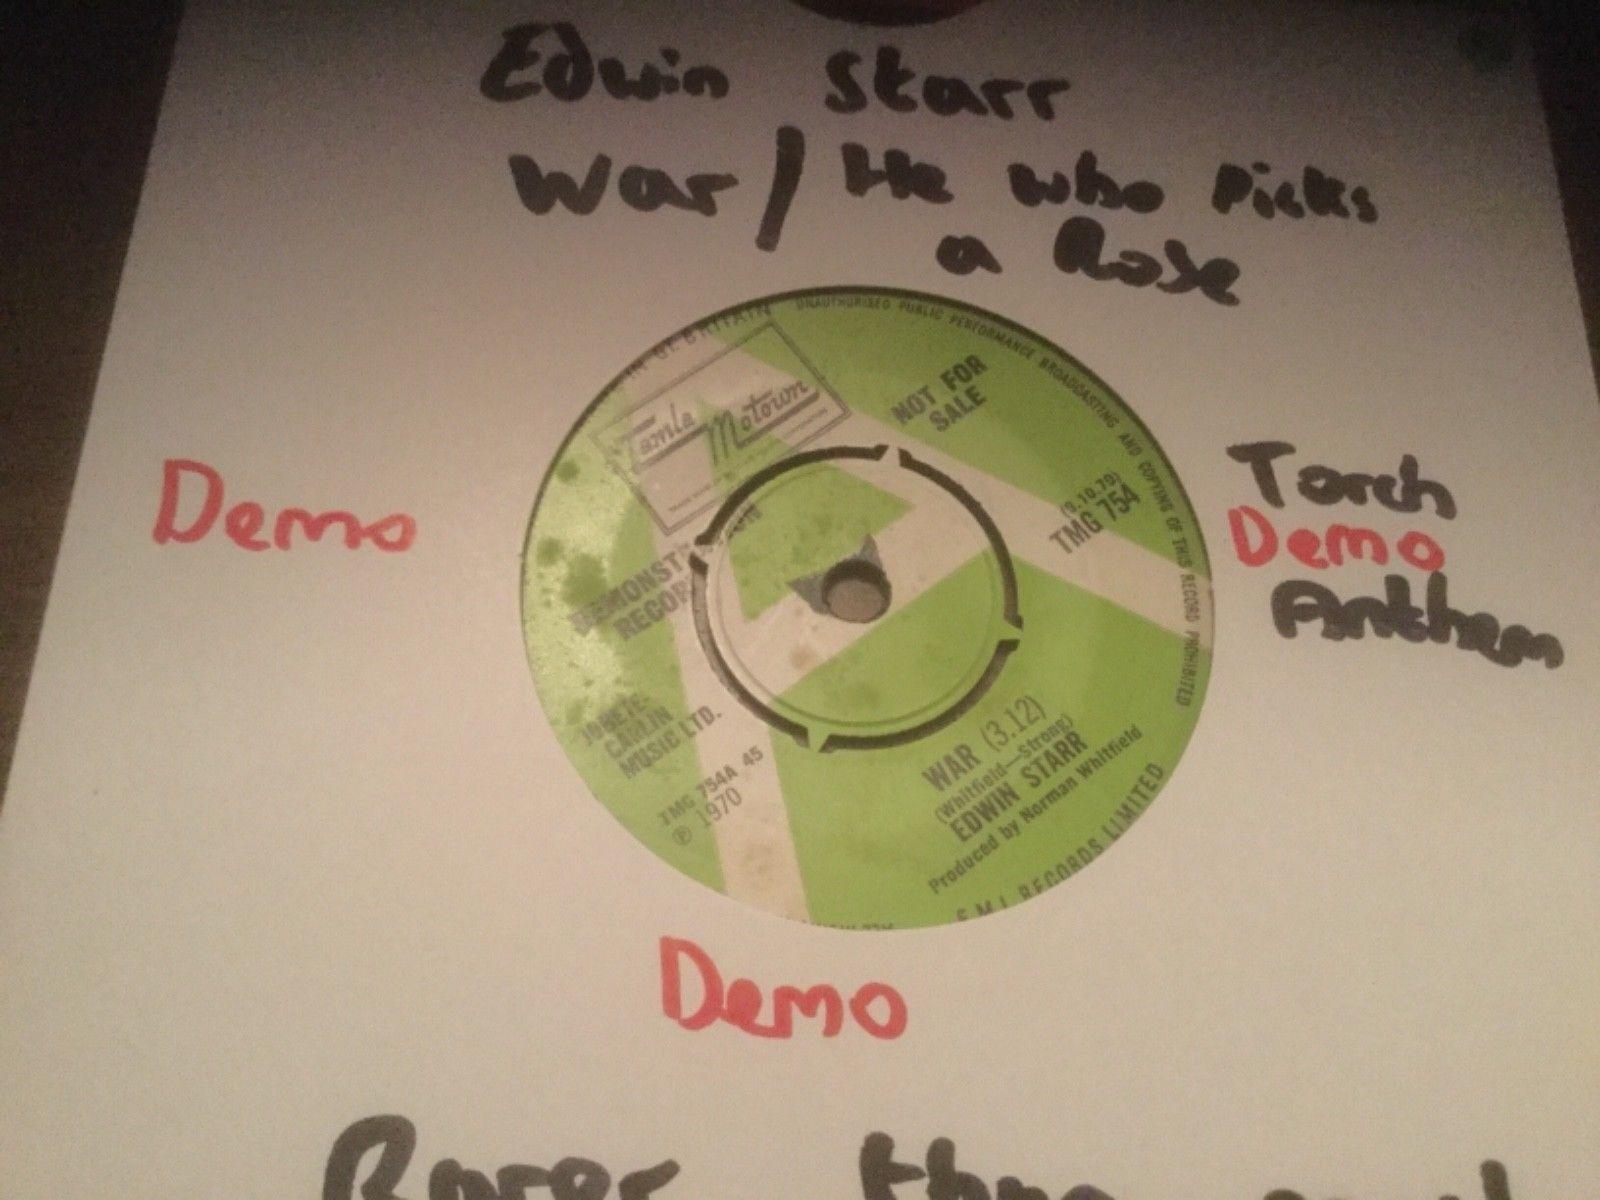 Edwin Starr War / he who picks a rose Tamla Motown green and white demo TMG 754